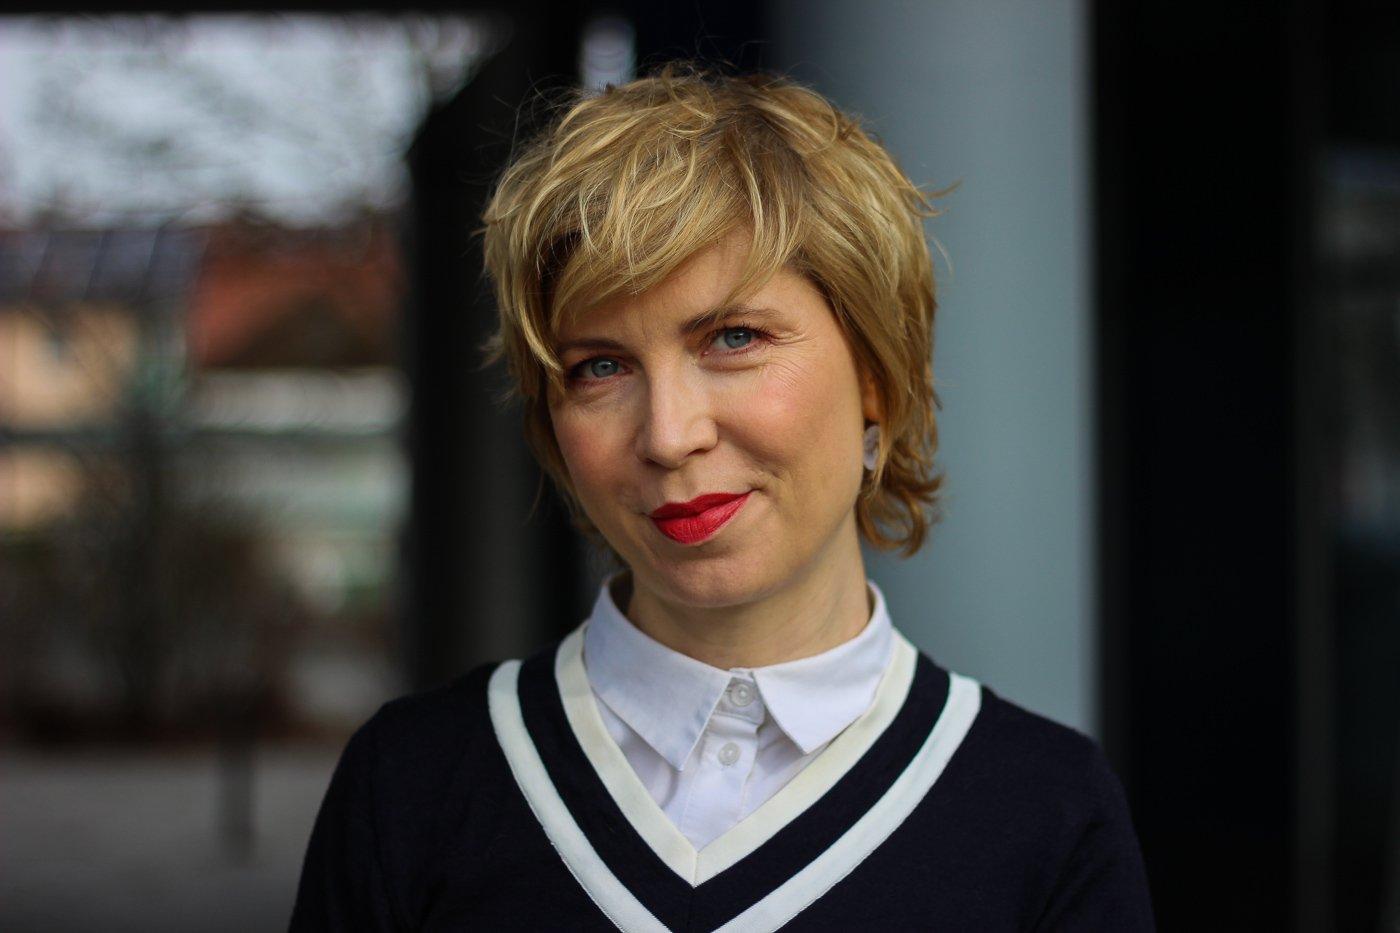 conny doll lifestyle: weiße Bluse, blauer Pullover, Porträt, 40plus